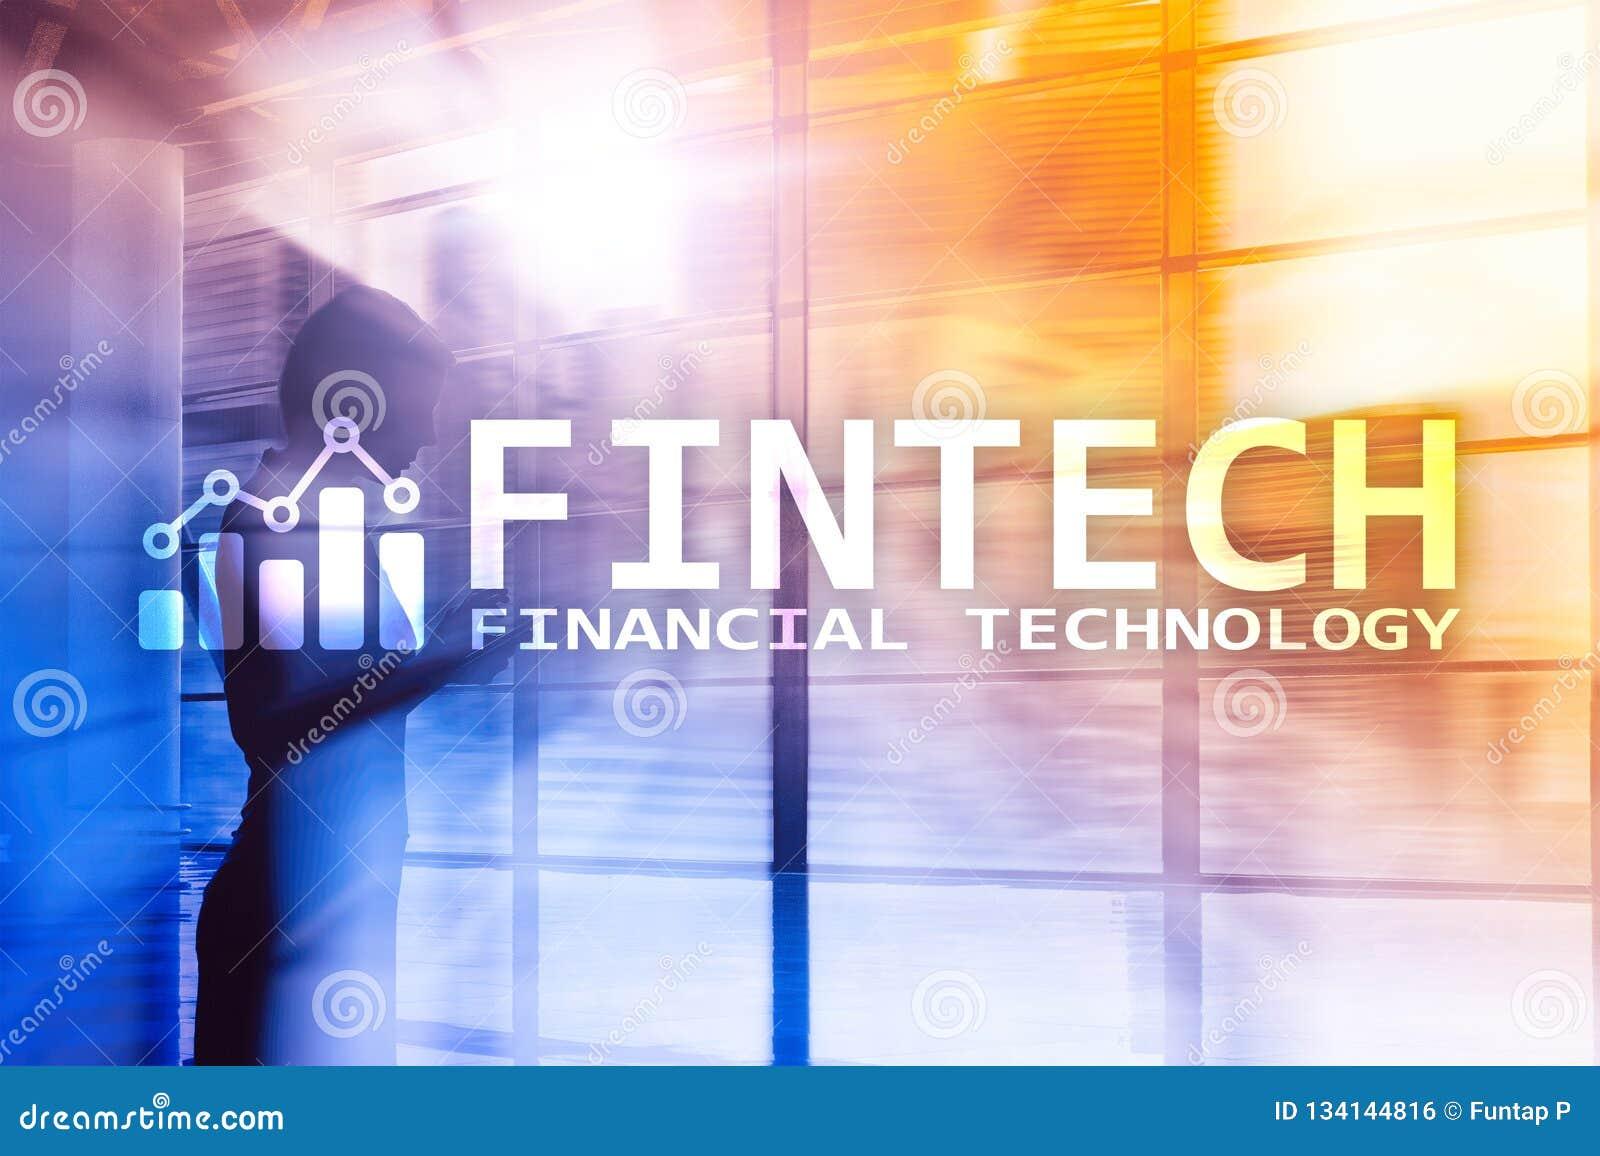 FINTECH - Financial technology, global business and information Internet communication technology. Skyscrapers